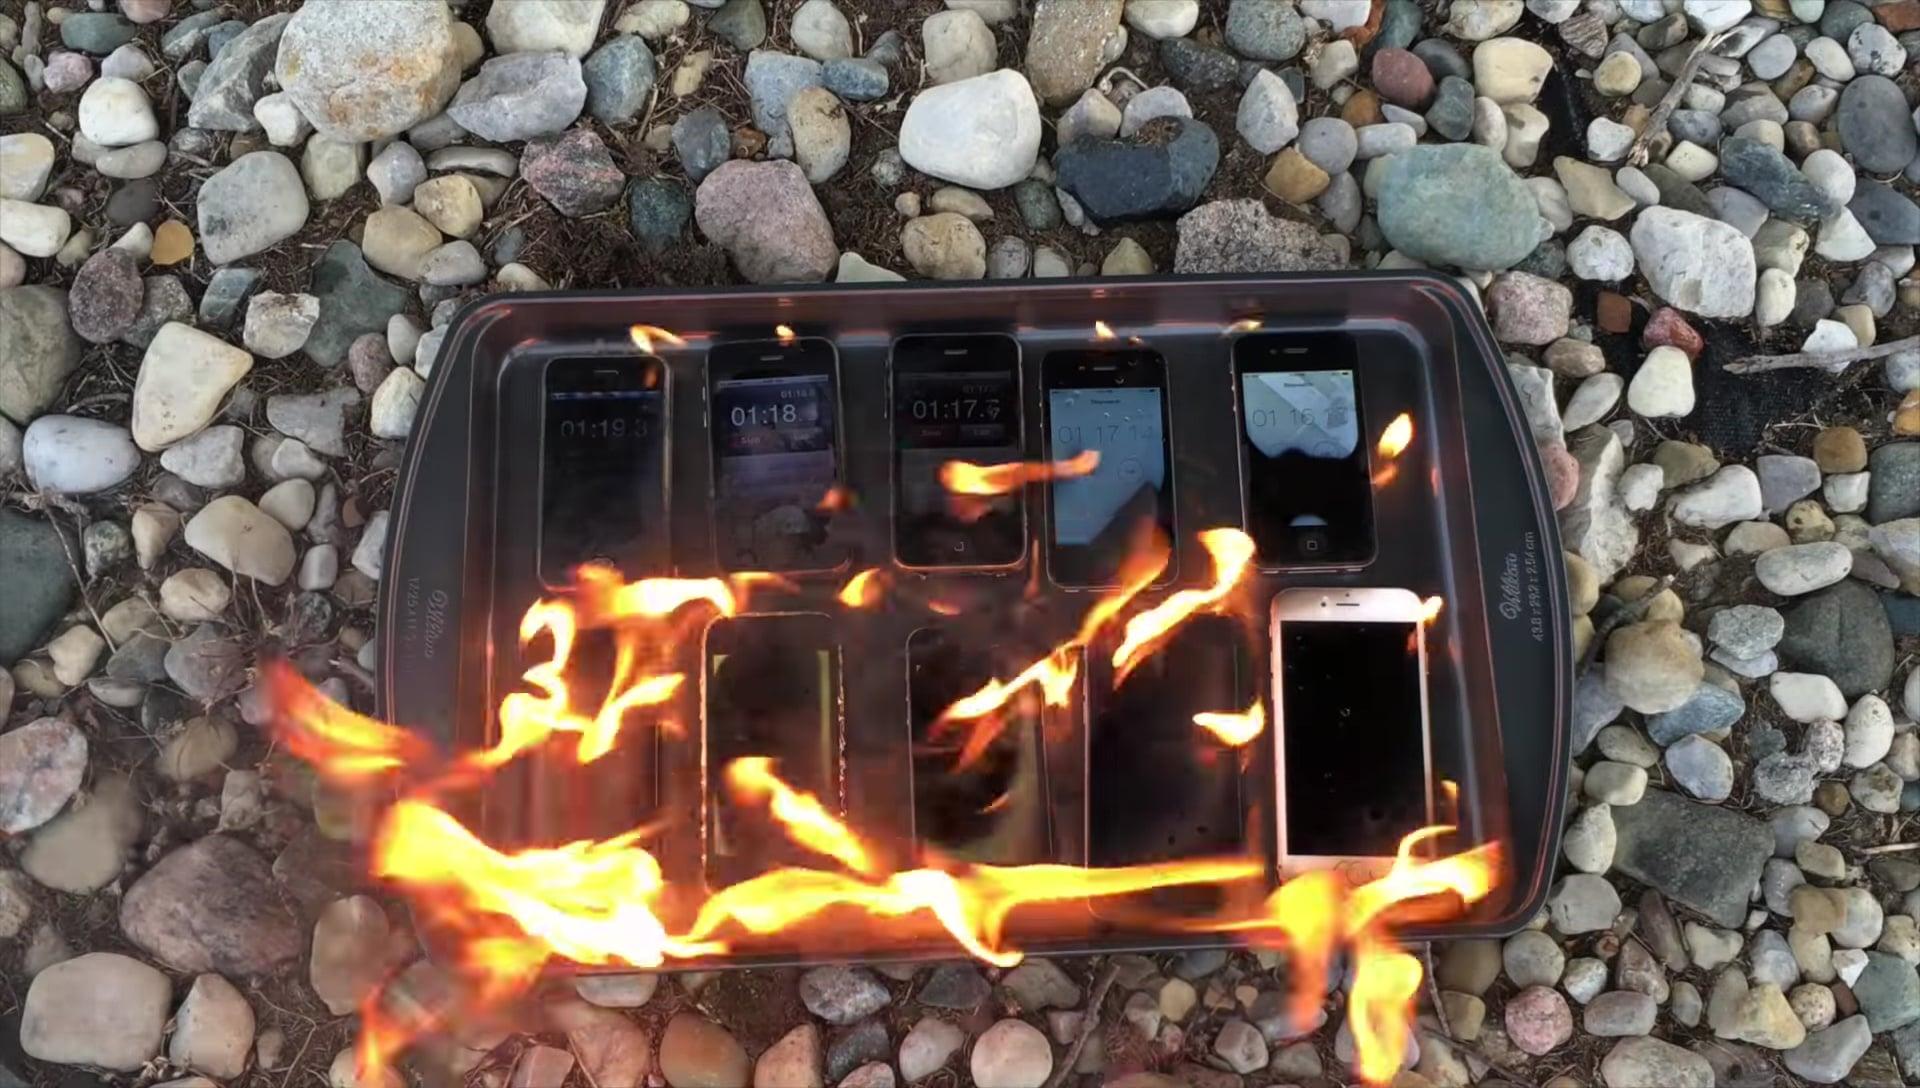 Iphonefamily fireprooftest 01